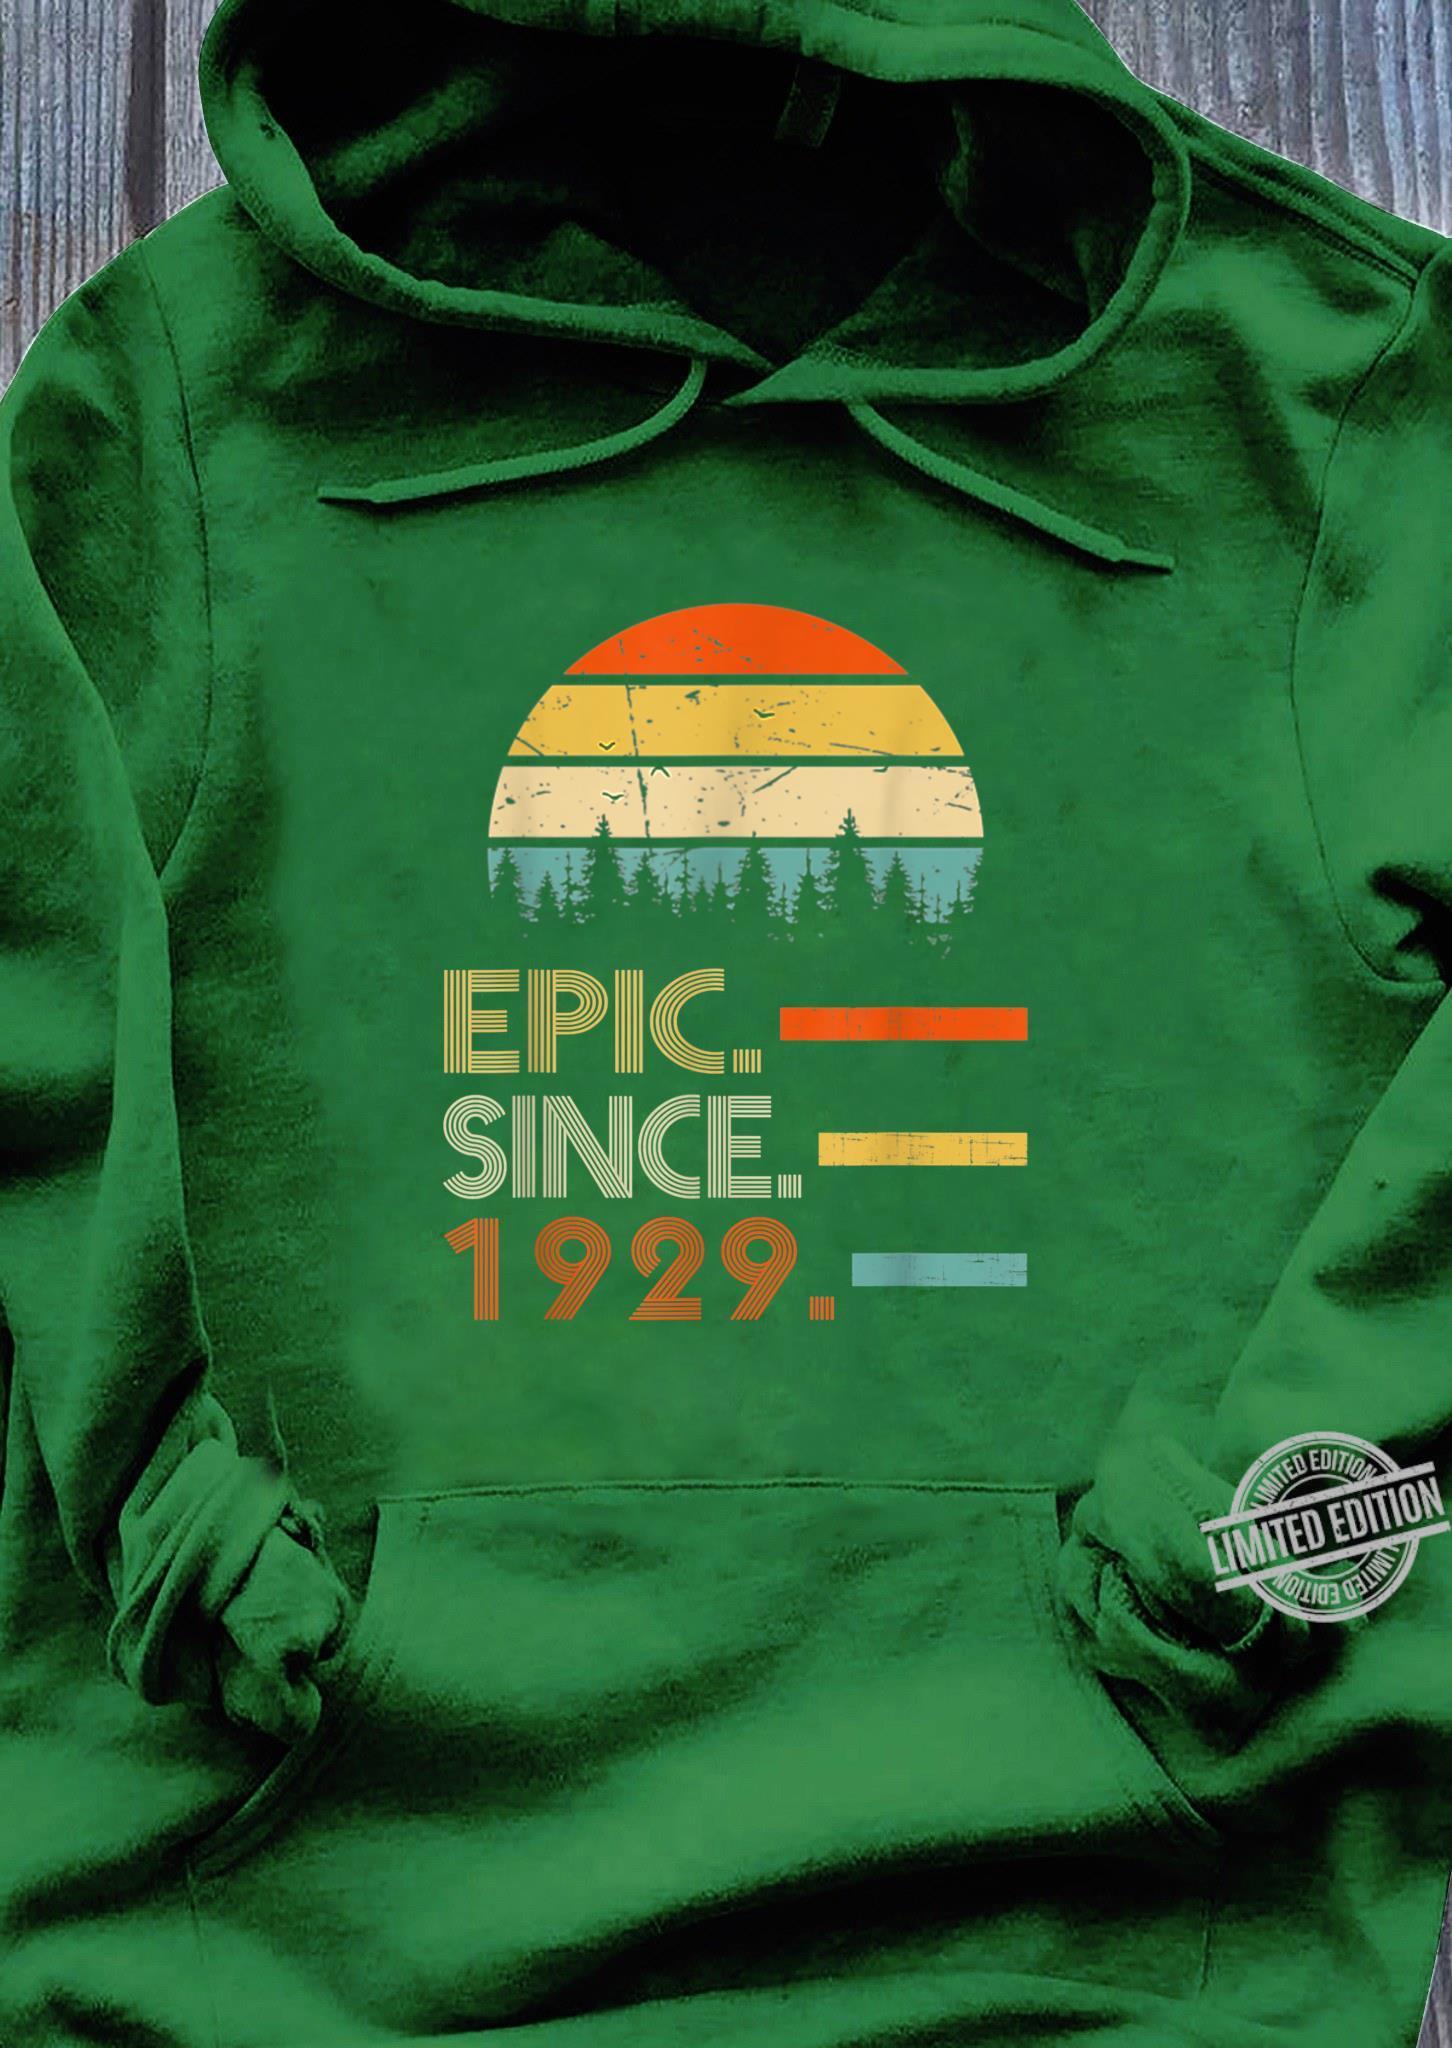 Epic Since 1929 91 Year Old Shirt 1929 Birthday Shirt hoodie